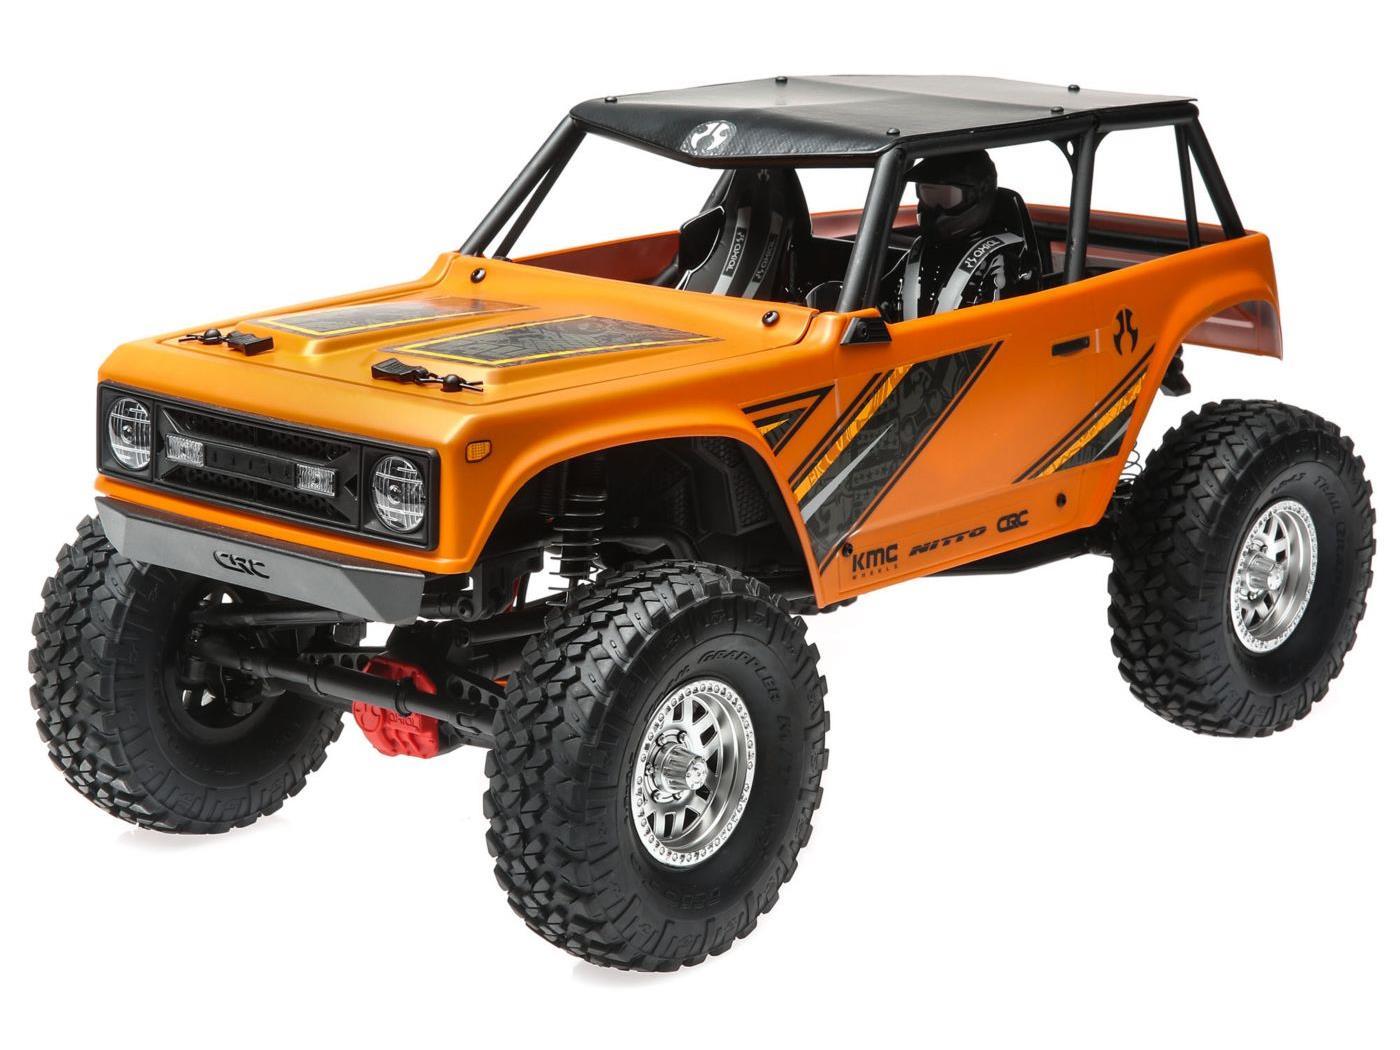 Axial Wraith 1.9 1/10 4WD RTR Orange or Black